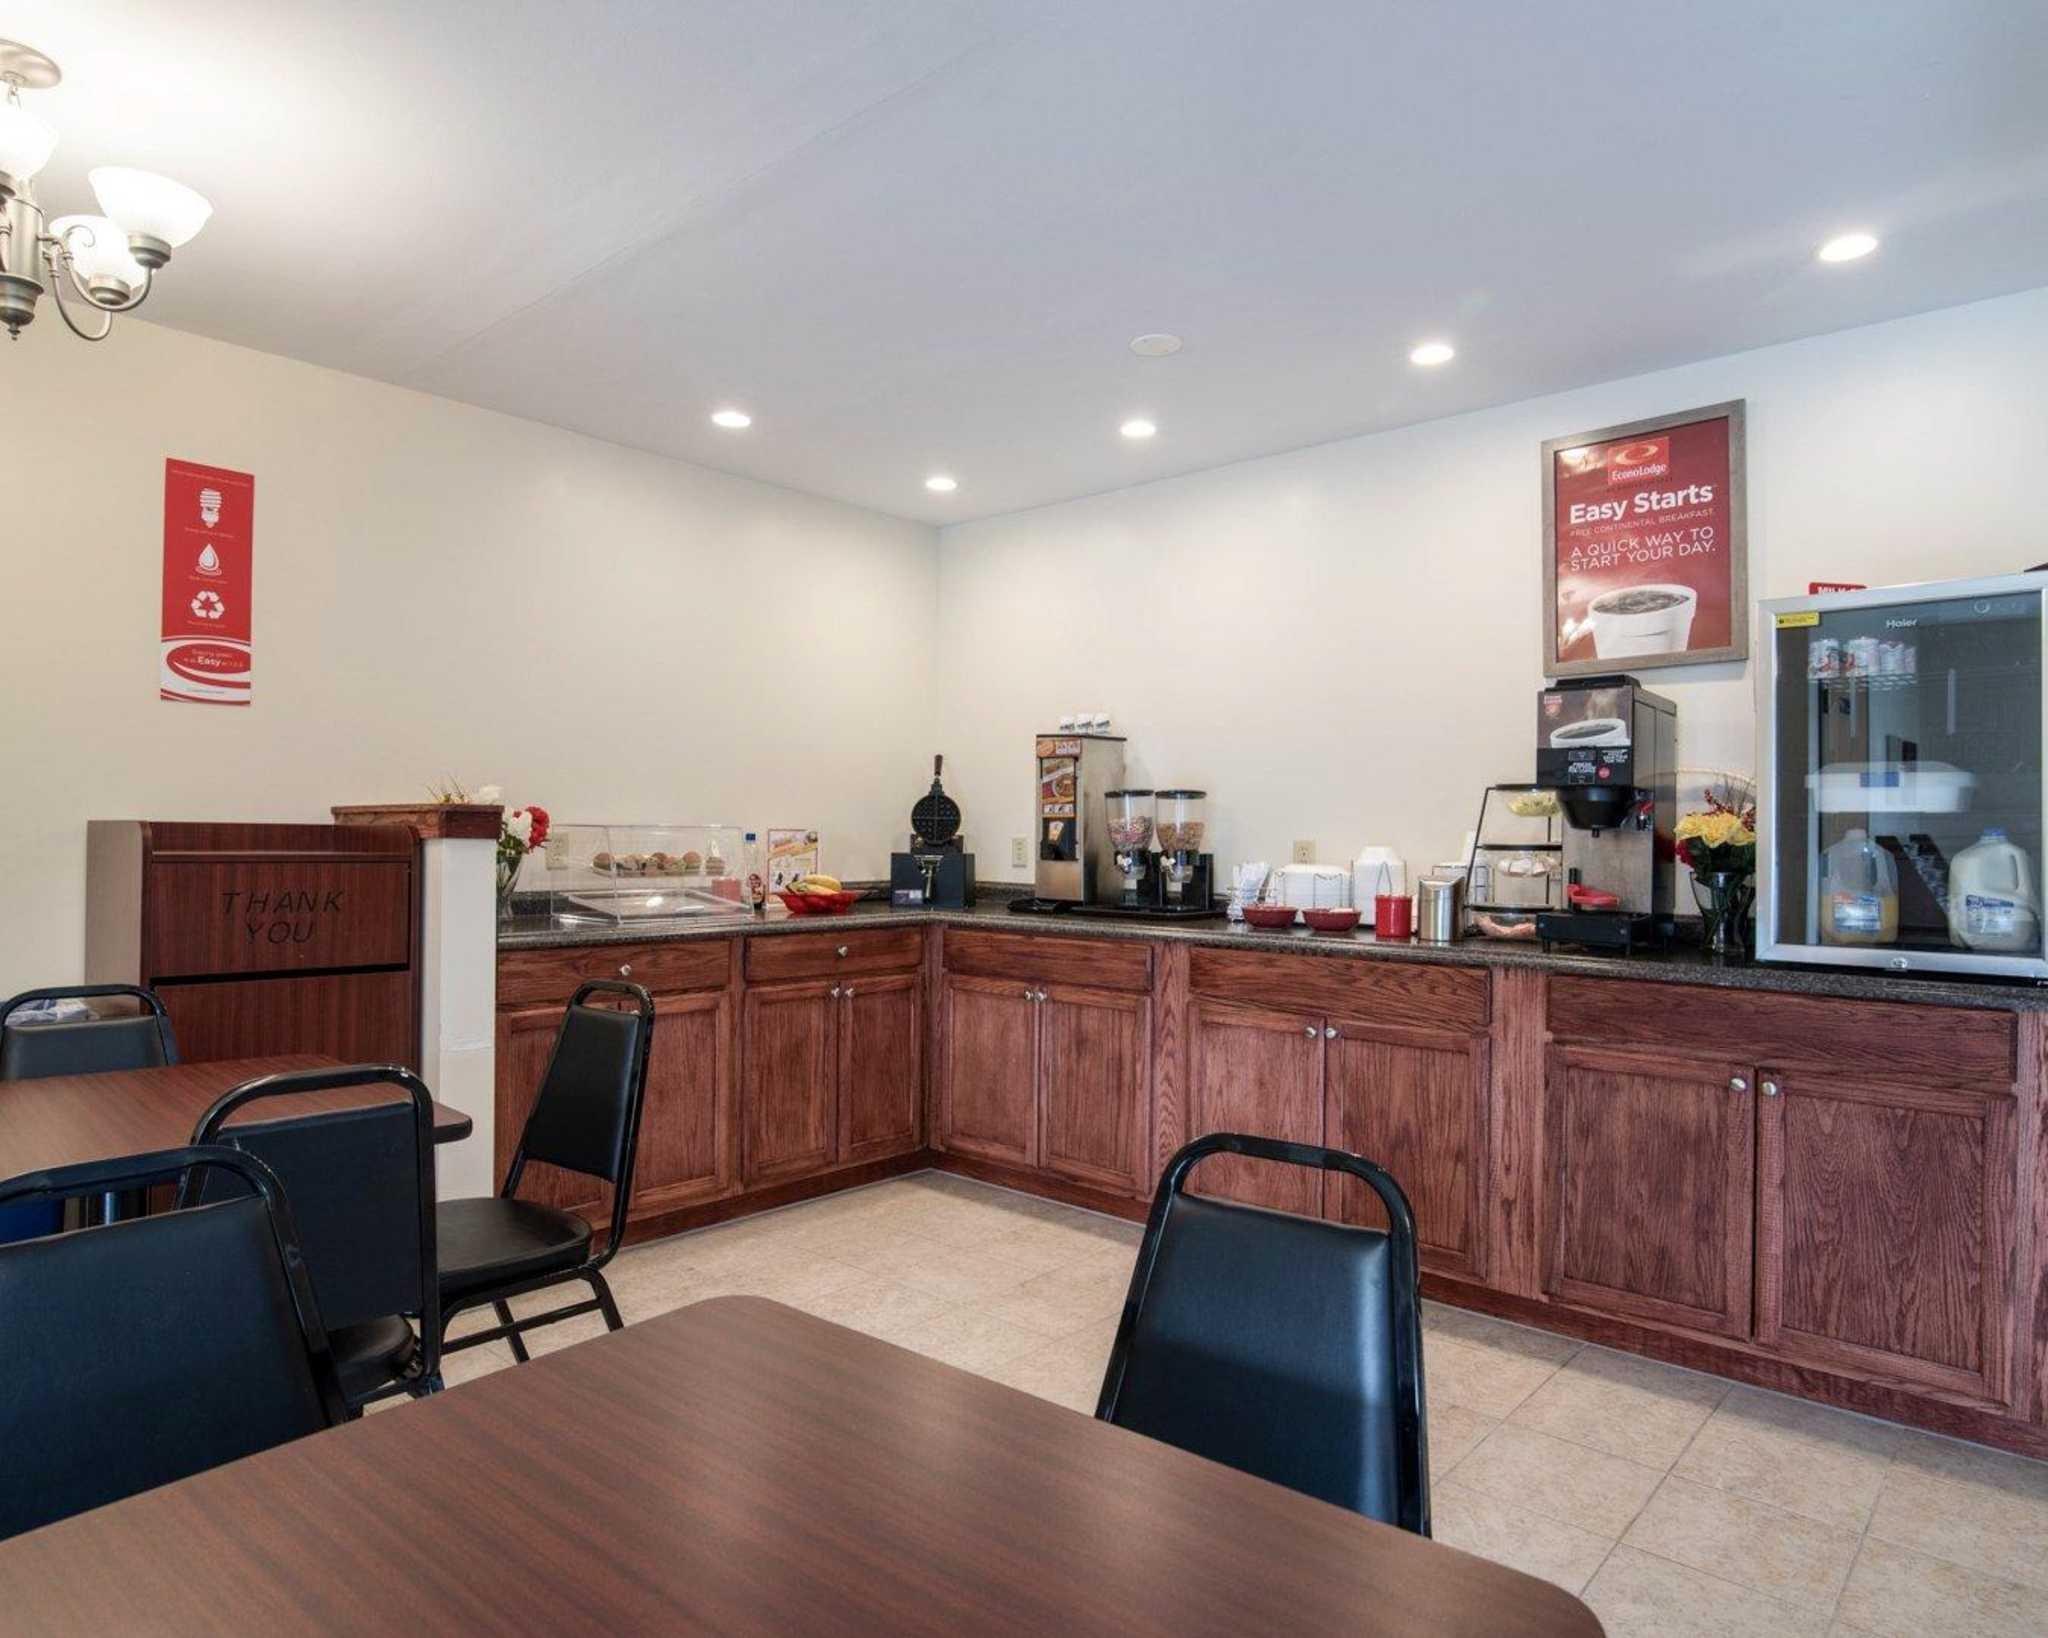 Econo Lodge Inn & Suites image 24